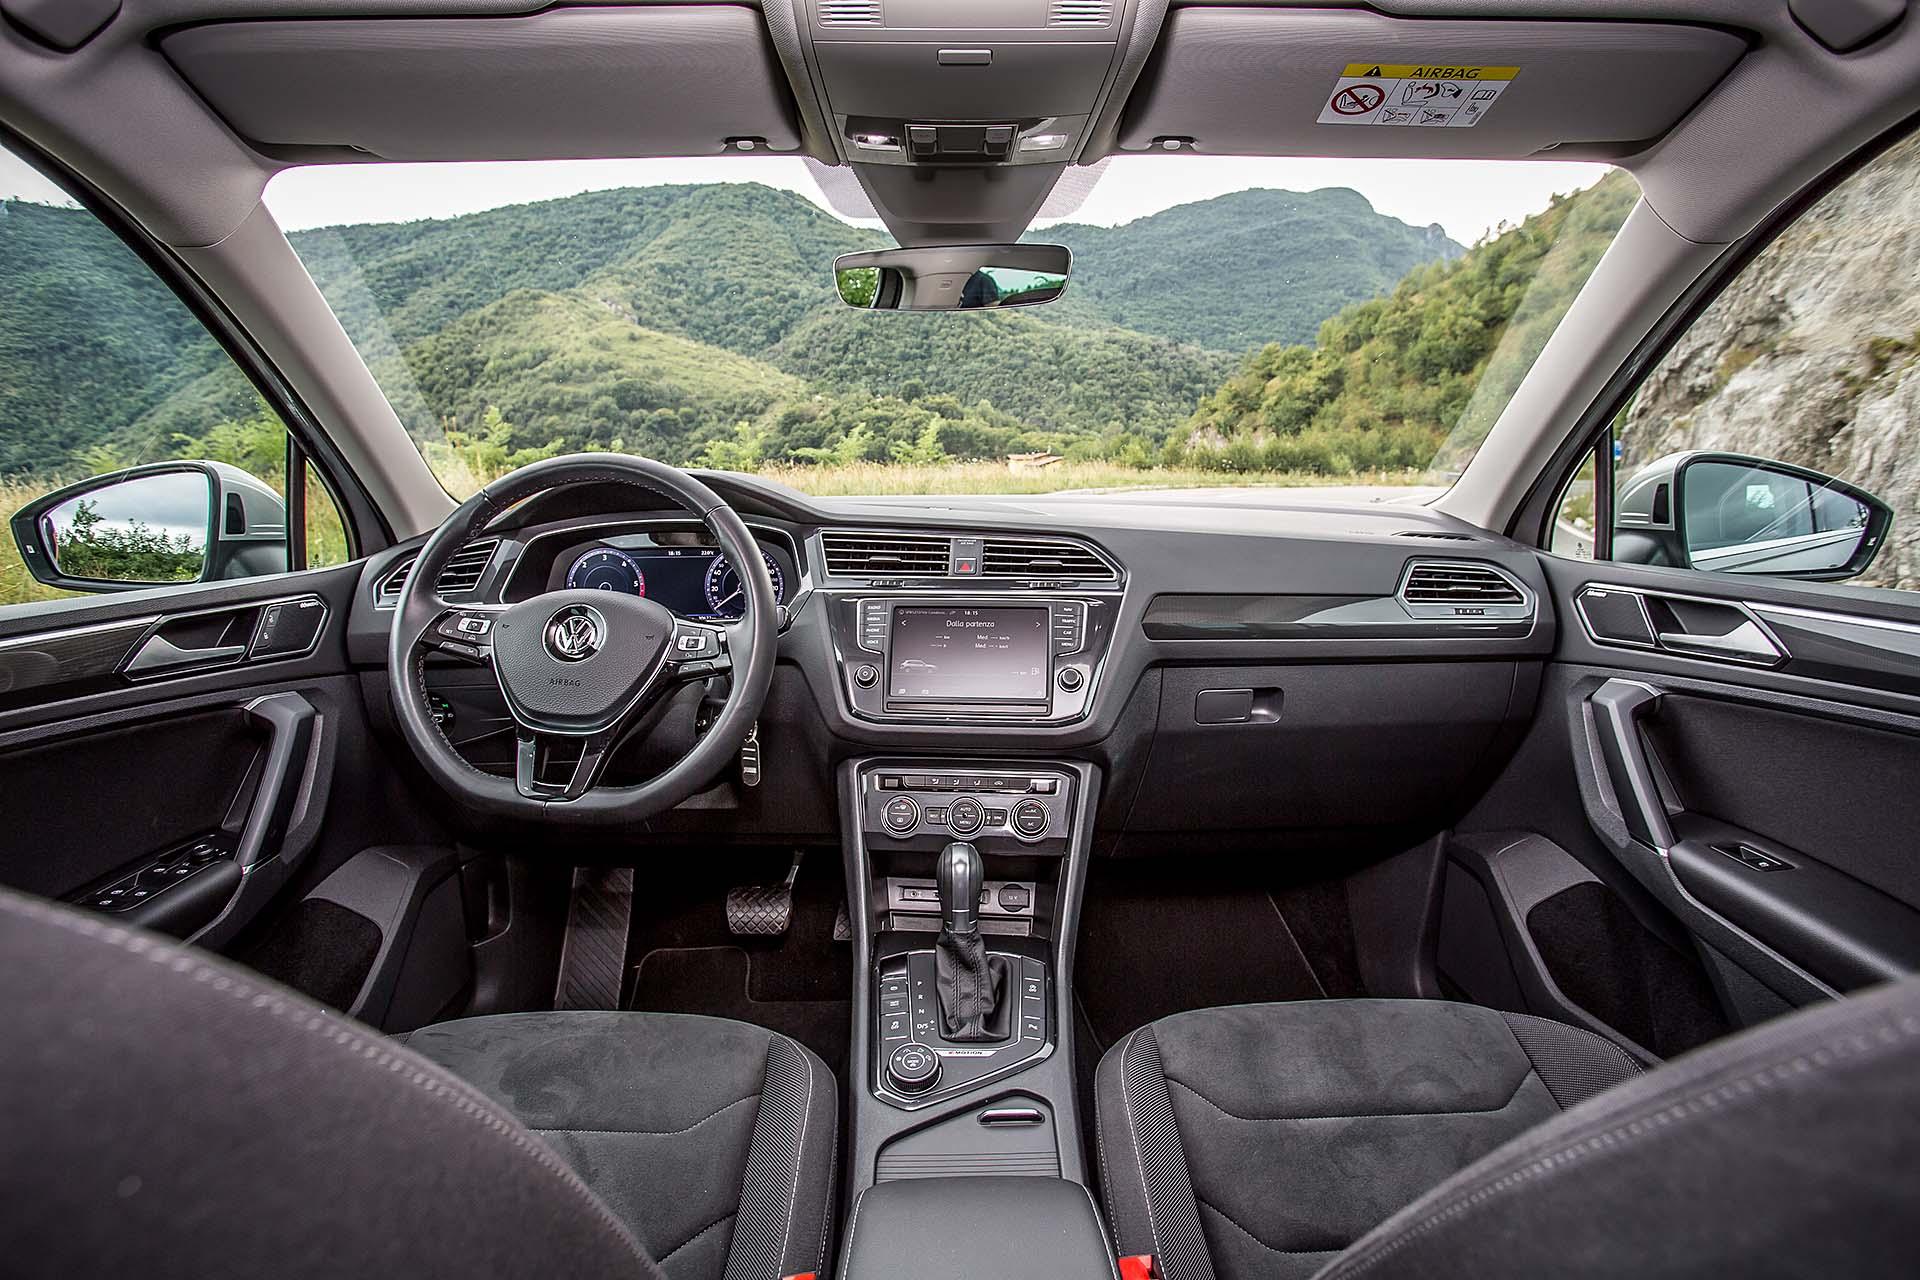 Volkswagen Tiguan 2.0 BiTDI - interni